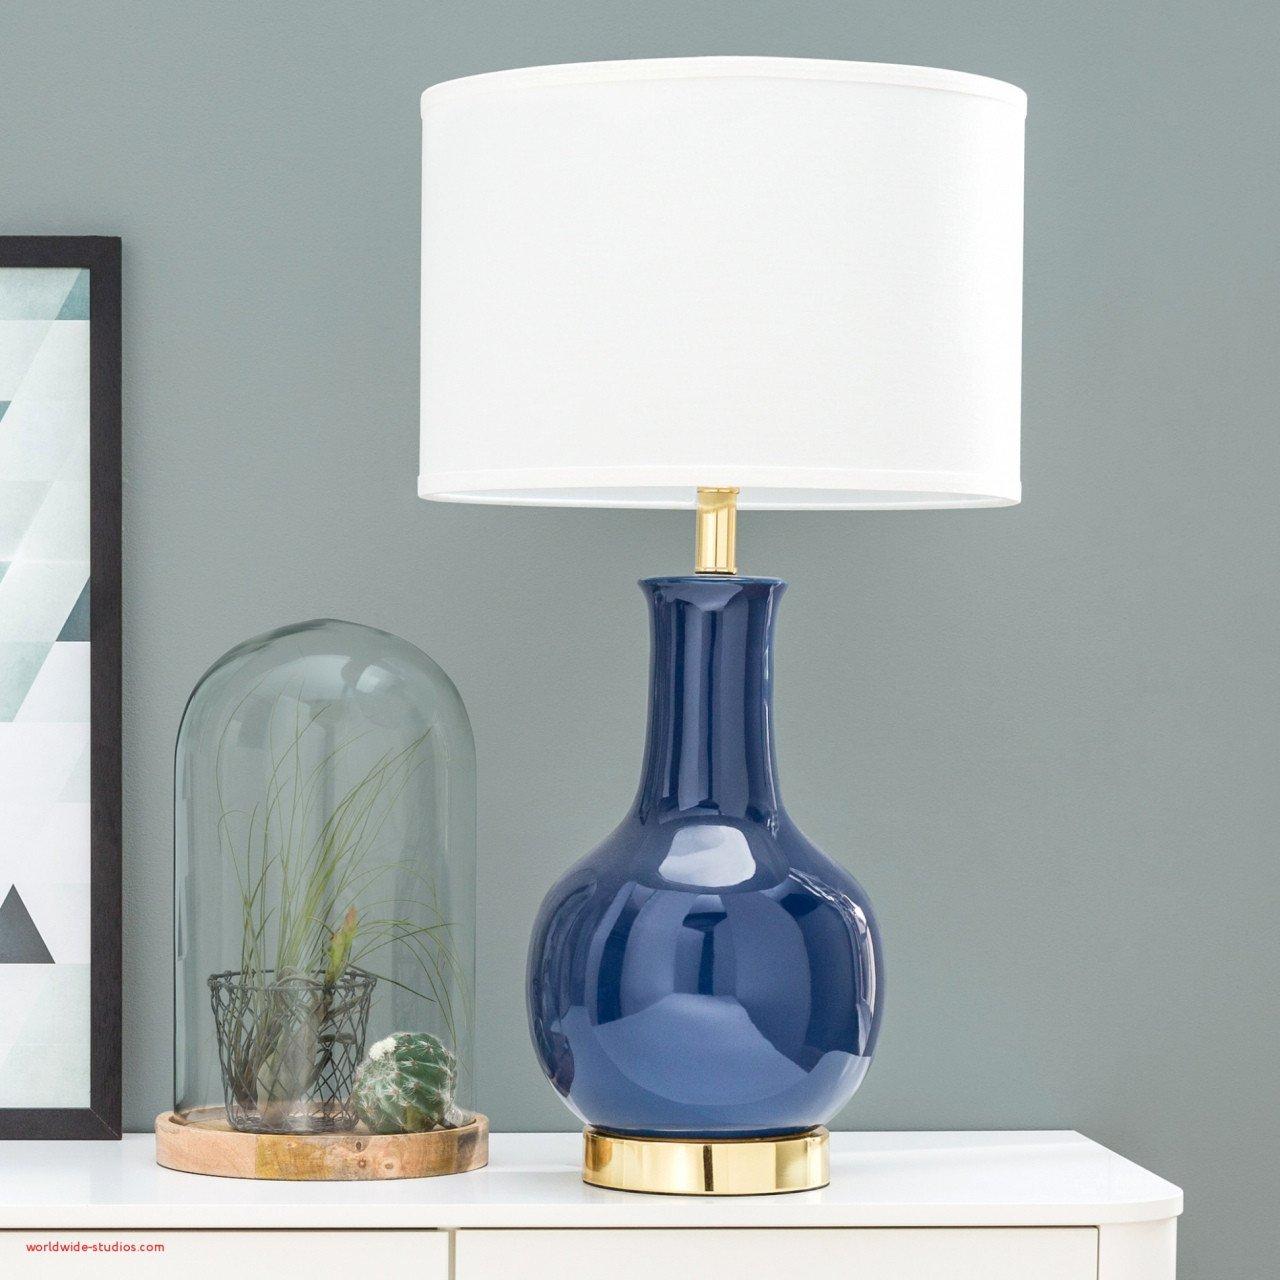 Modern Table Lamp for Bedroom Best Of Deer Antler Table Lamps — Procura Home Blog